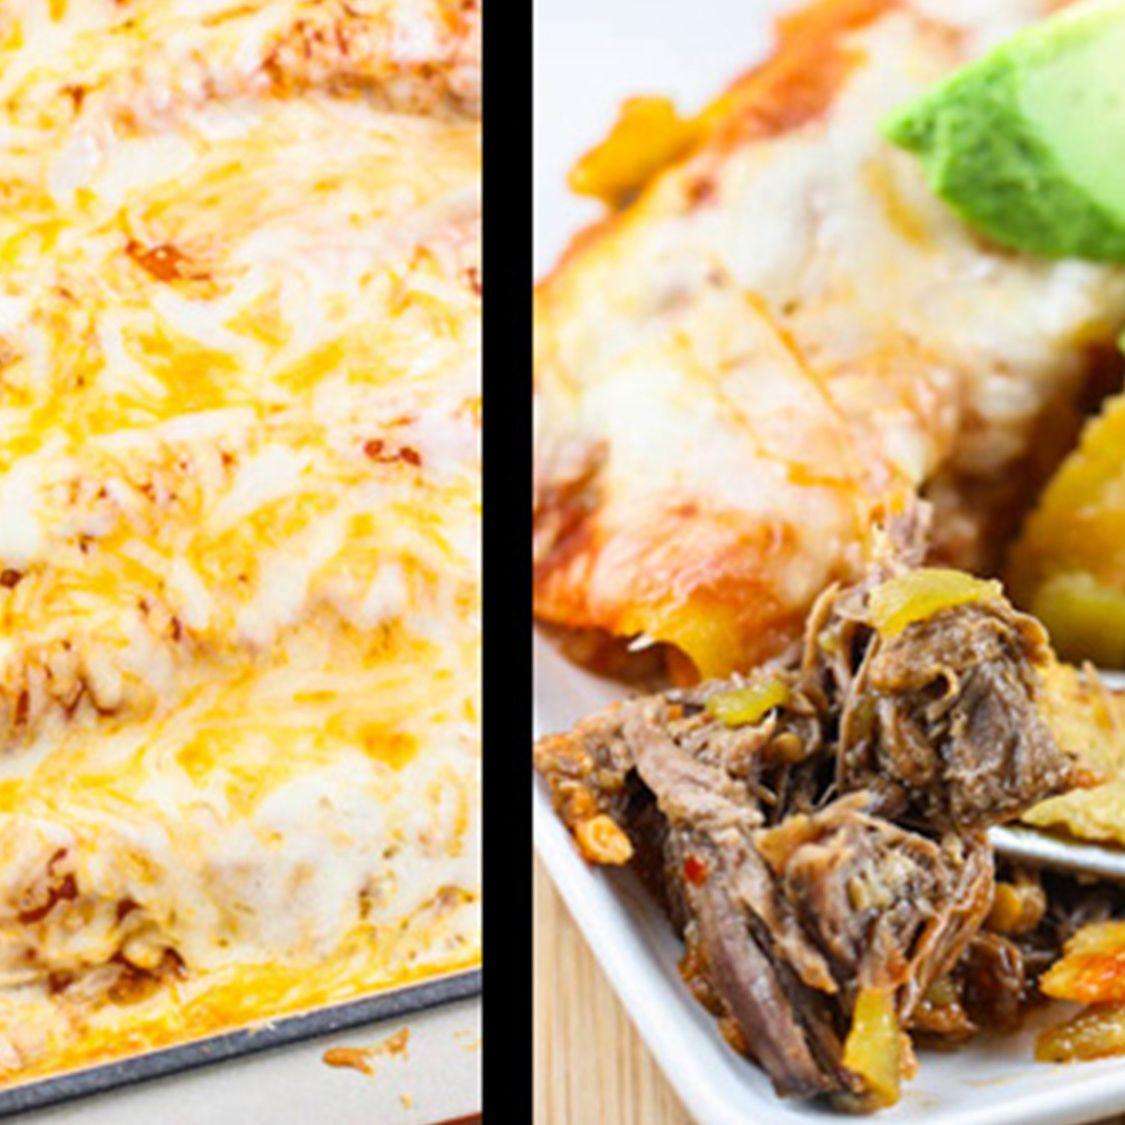 shredded_beef_enchiladas.jpg